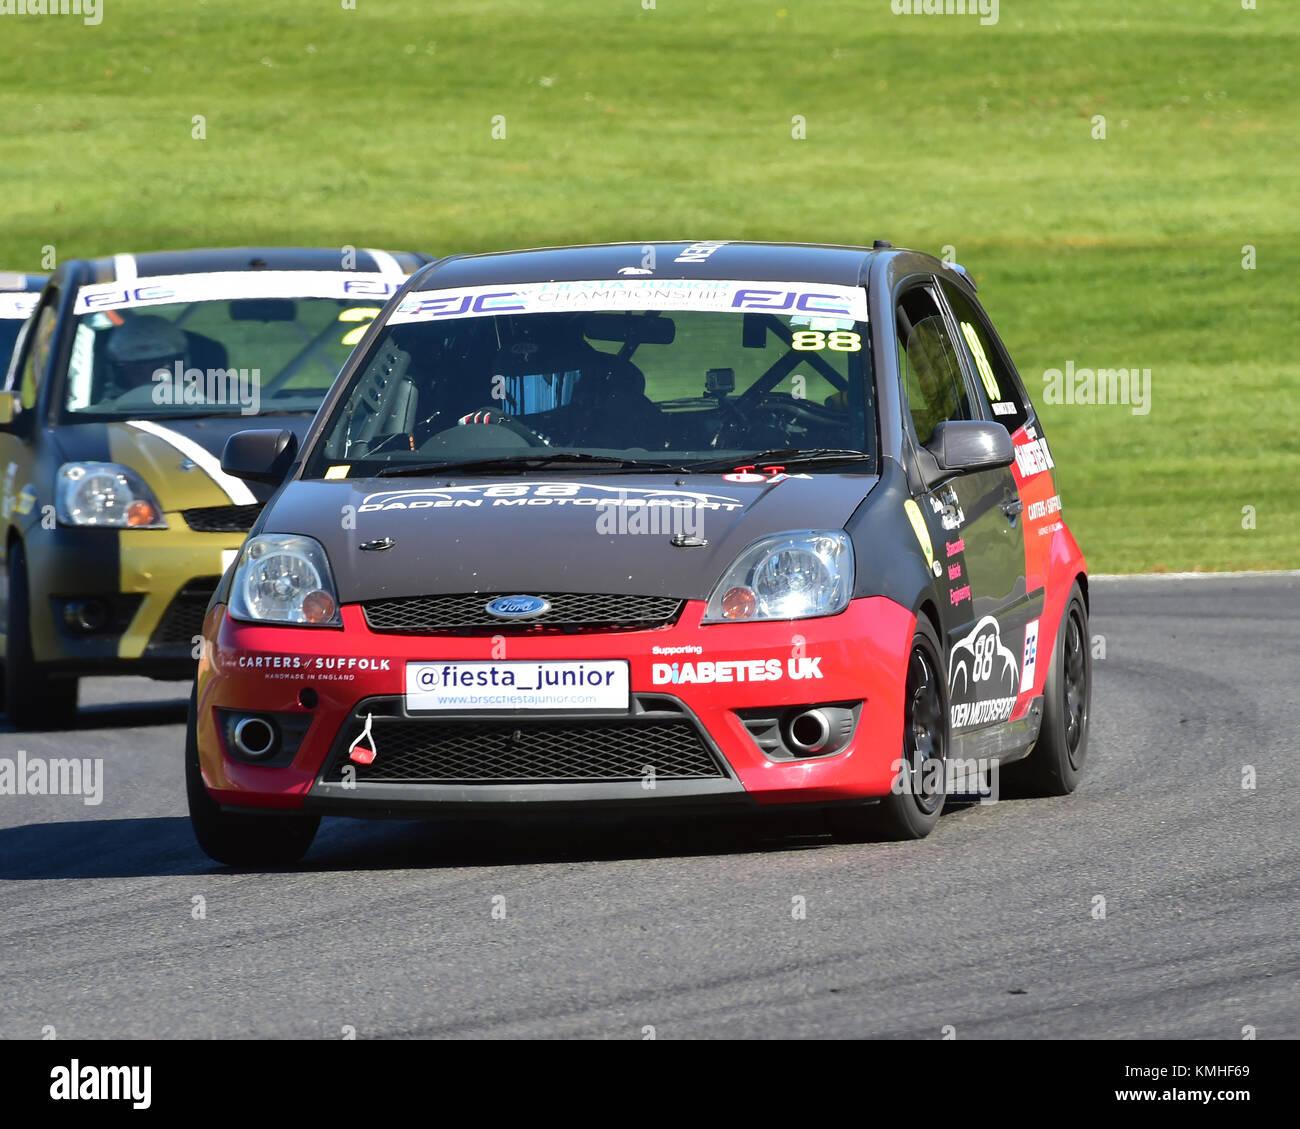 Image Result For Ford Fiesta Nottingham